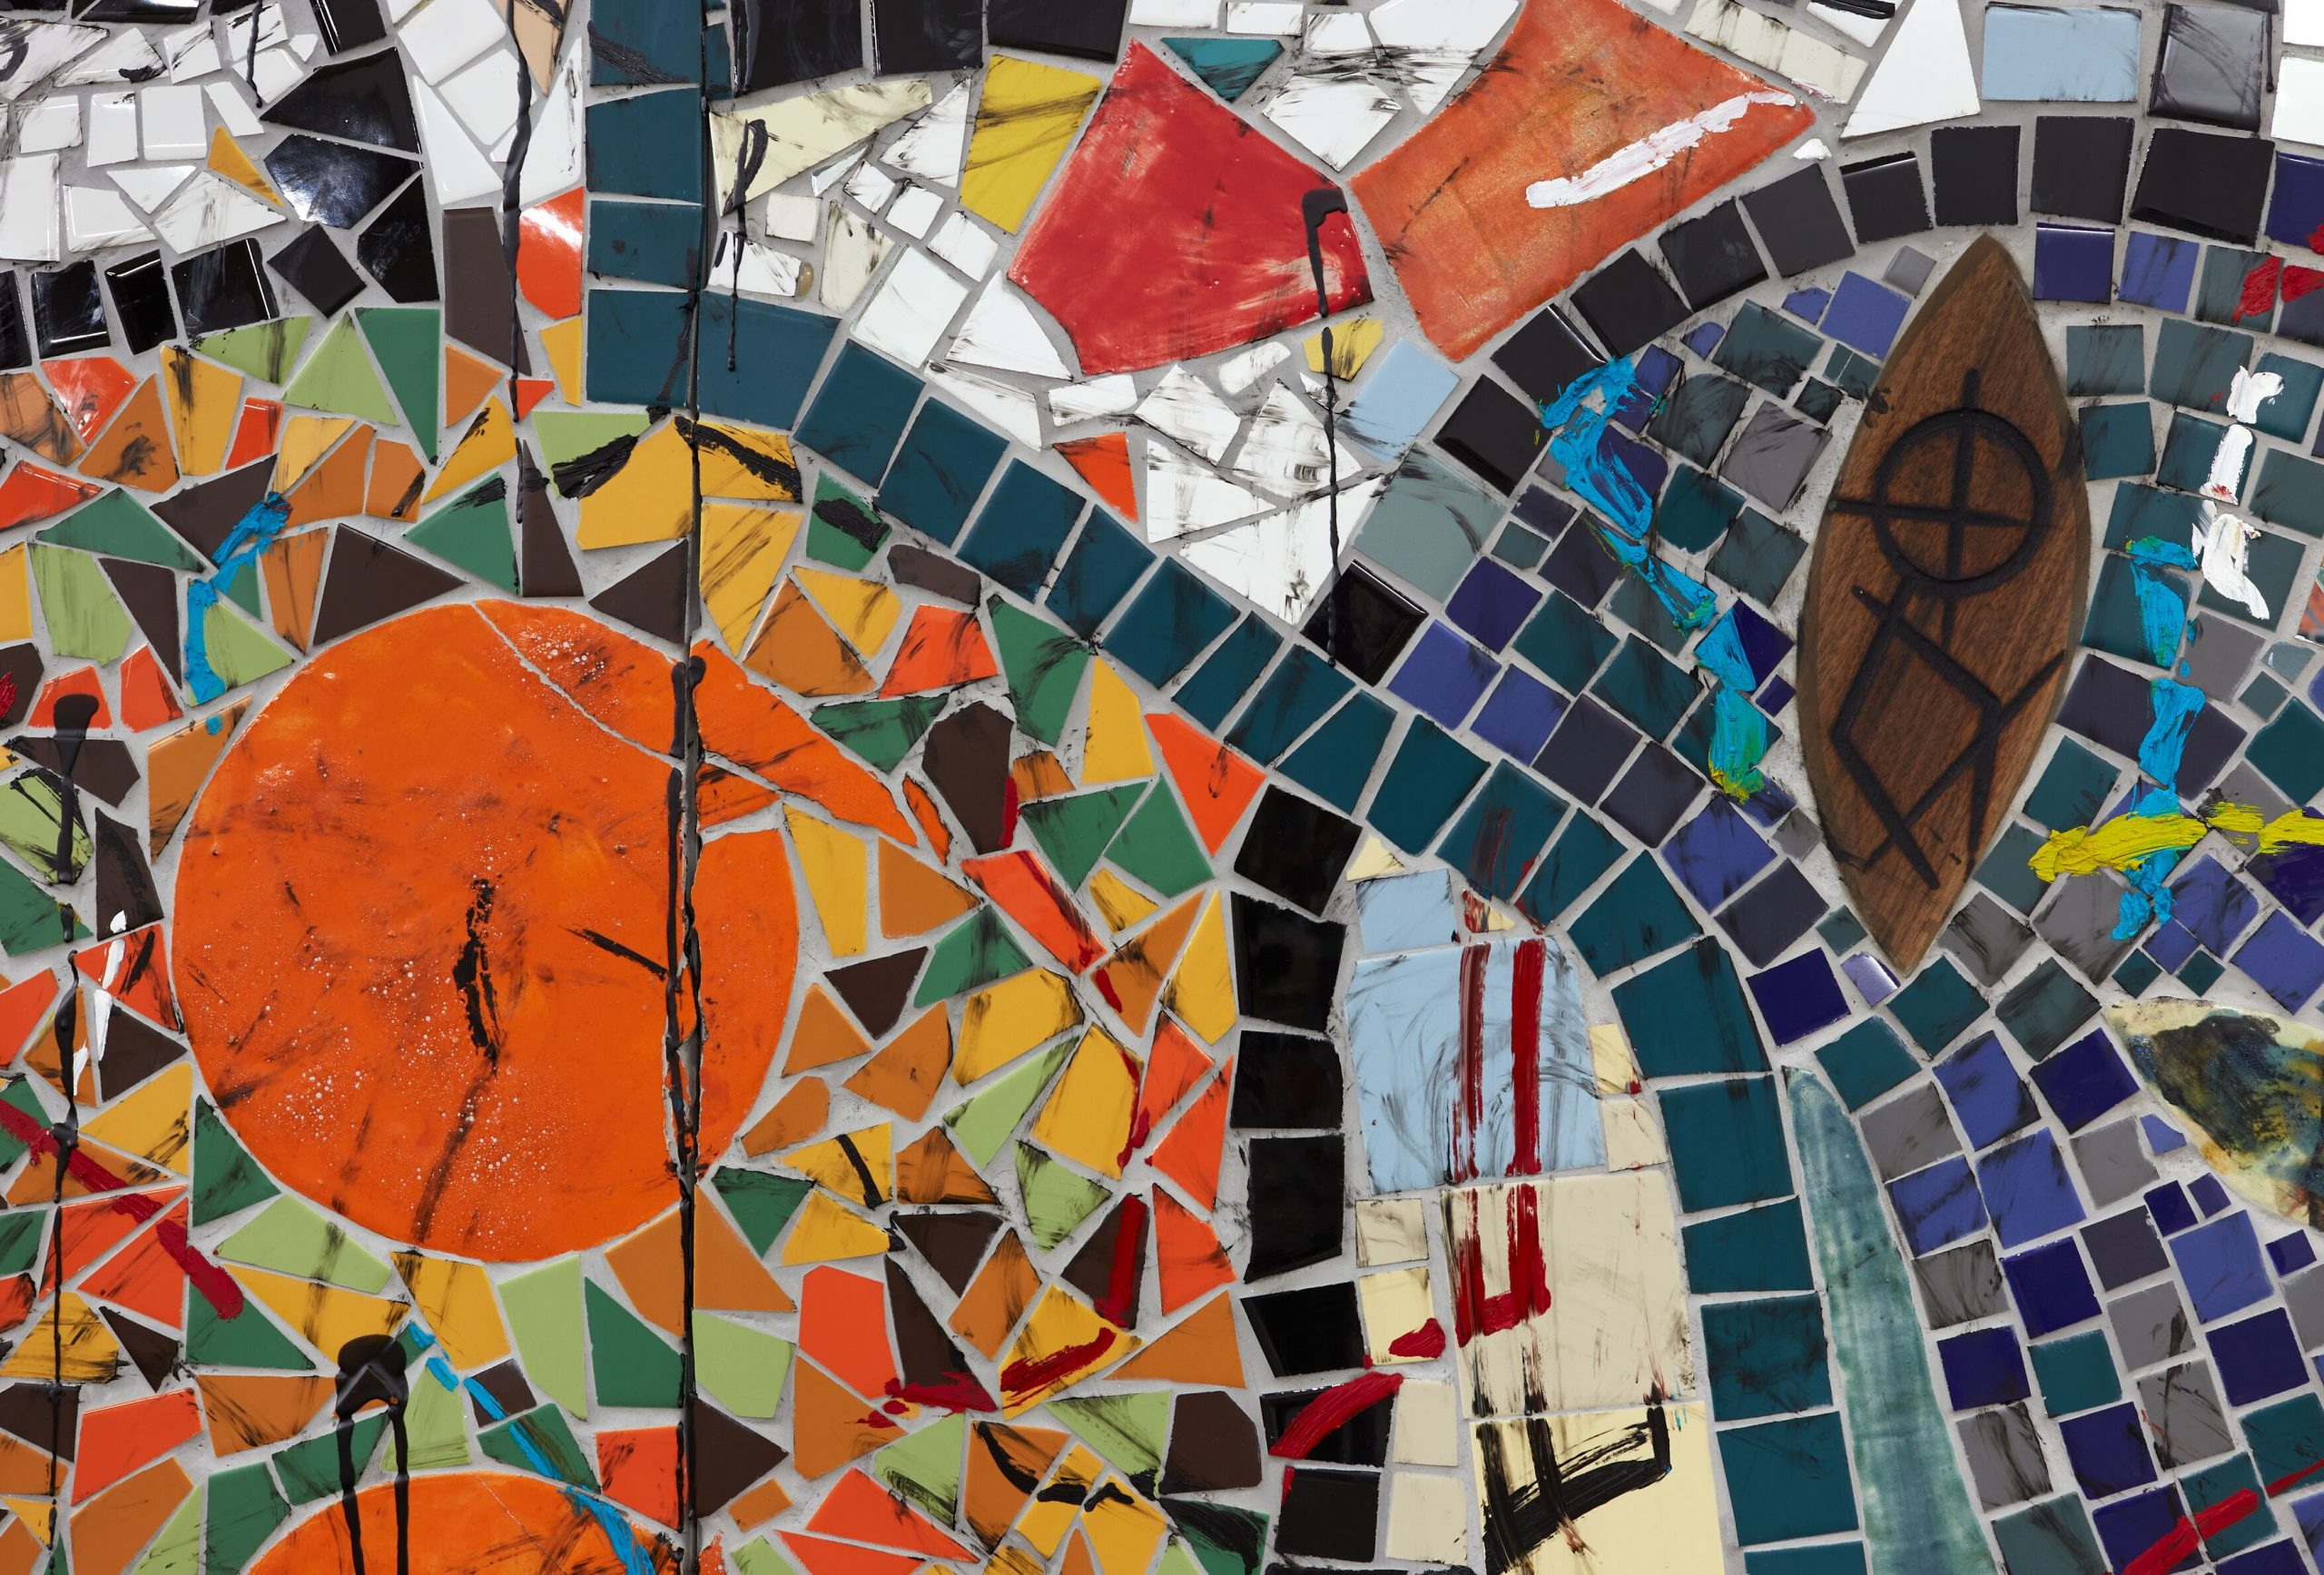 Rashid Johnson?The Broken Five (detail)?2020?Ceramic tile, mirror tile, spray enamel, oil stick, black soap, wax?250.2 x 430.5 cm Photo: Martin Parsekian FAD magazine